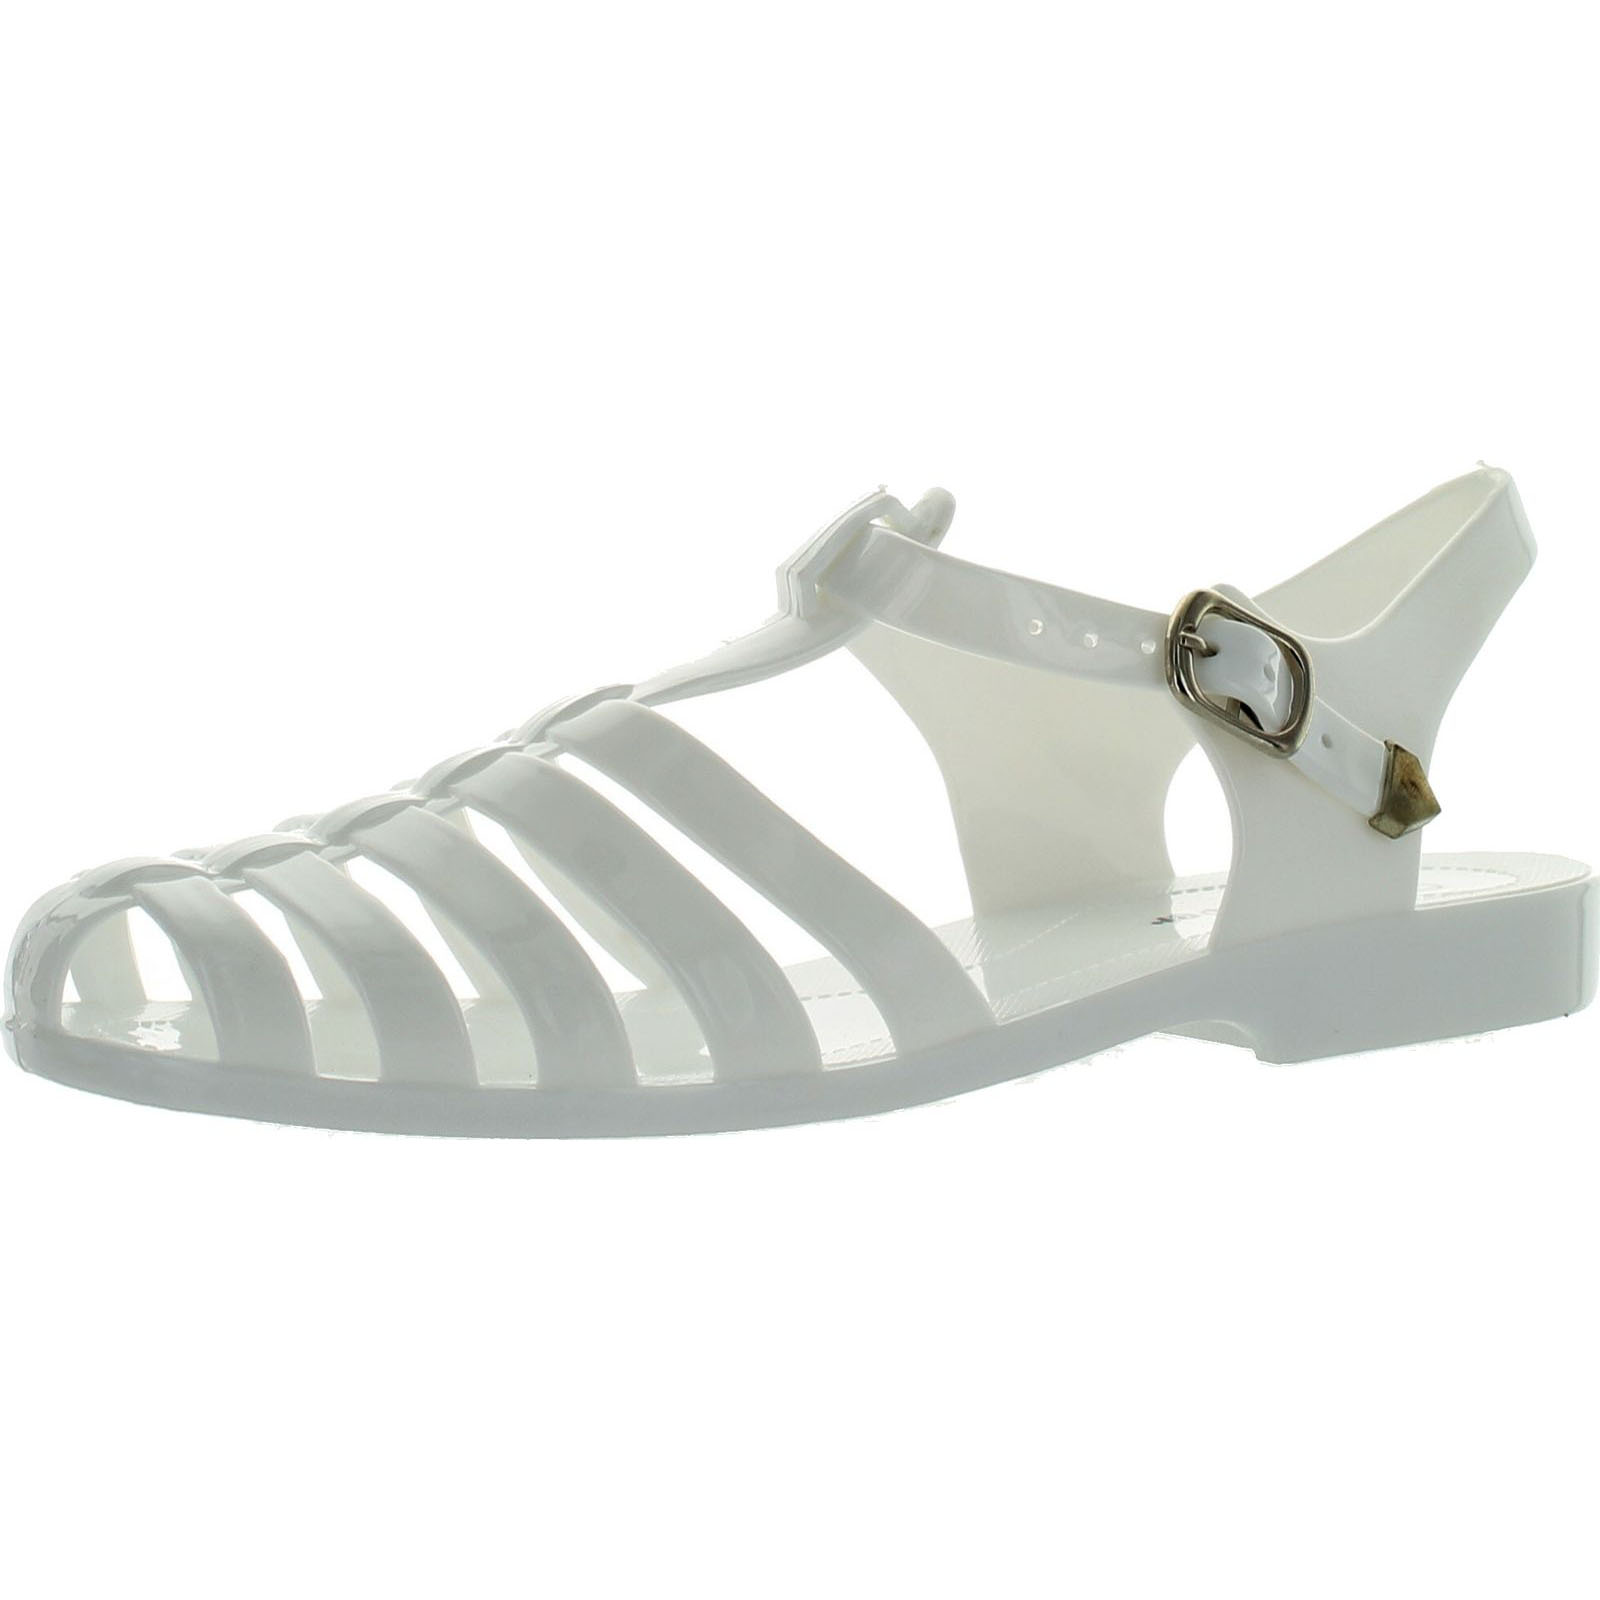 2ea8ad37b Static Footwear - Forever Womens Jedi Summer T-Strap Retro Jelly Rain Flat  Sandals - Walmart.com